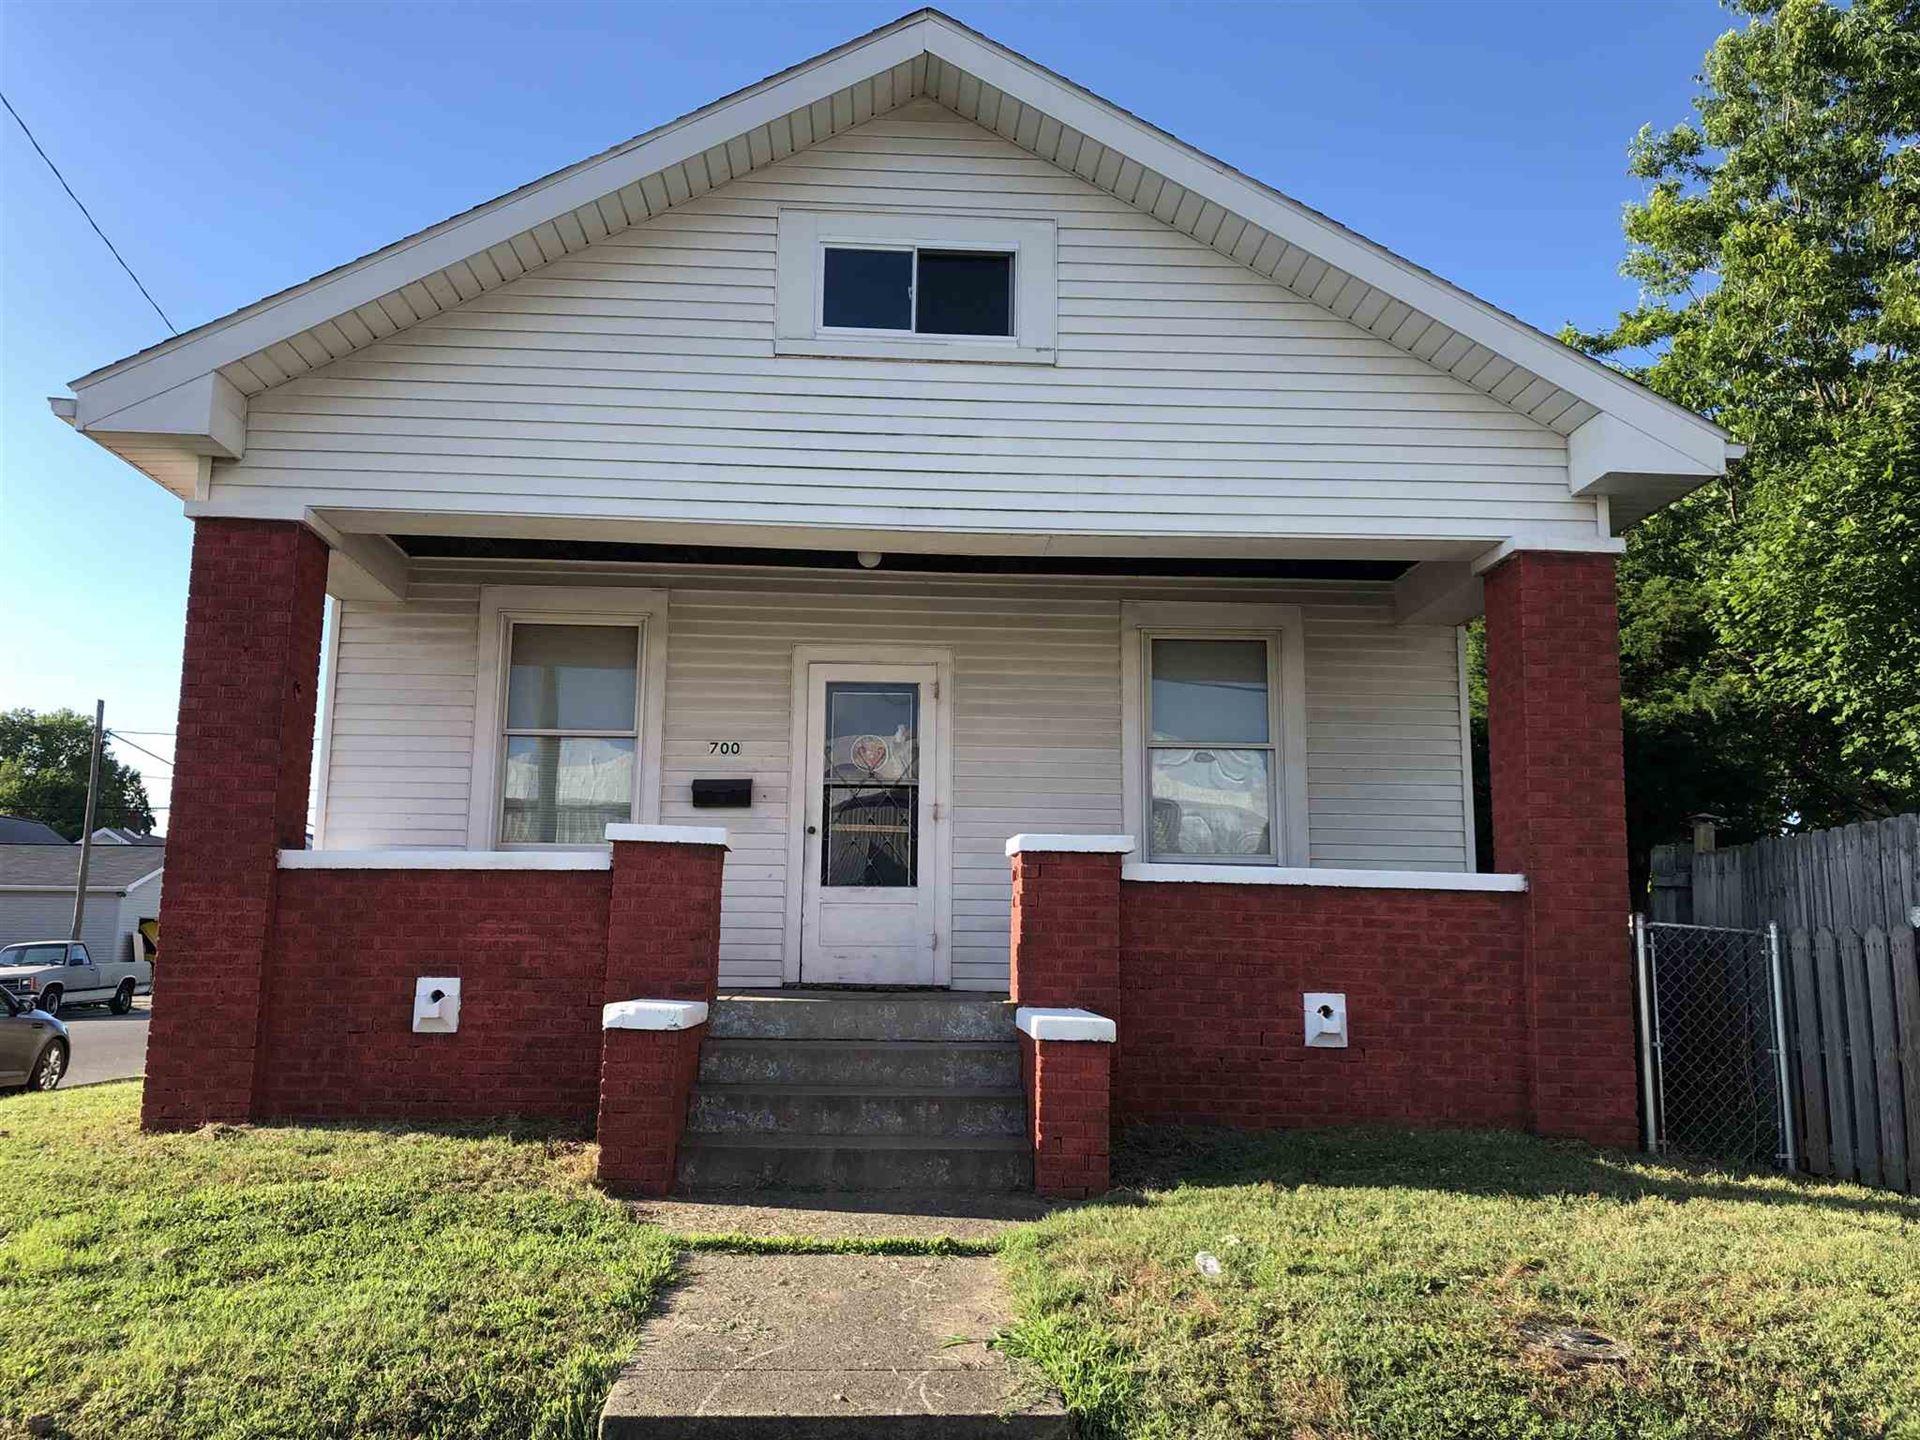 700 Maxwell Avenue, Evansville, IN 47711 - #: 202024090